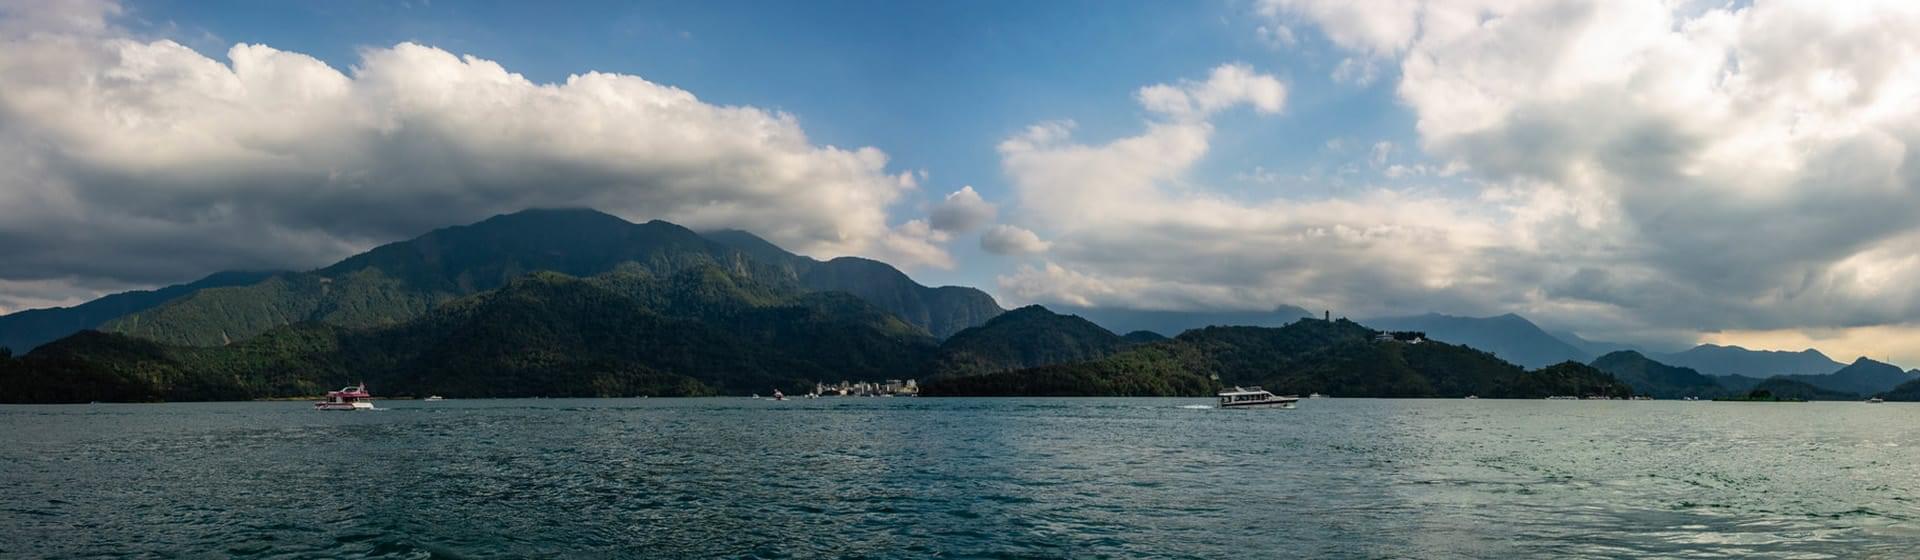 Озеро Солнца и Луны, местечко Пули и Луган <br> Тайбэй — Наньтоу — Пули — озеро Солнци и Луны — Луган — Тайбэй